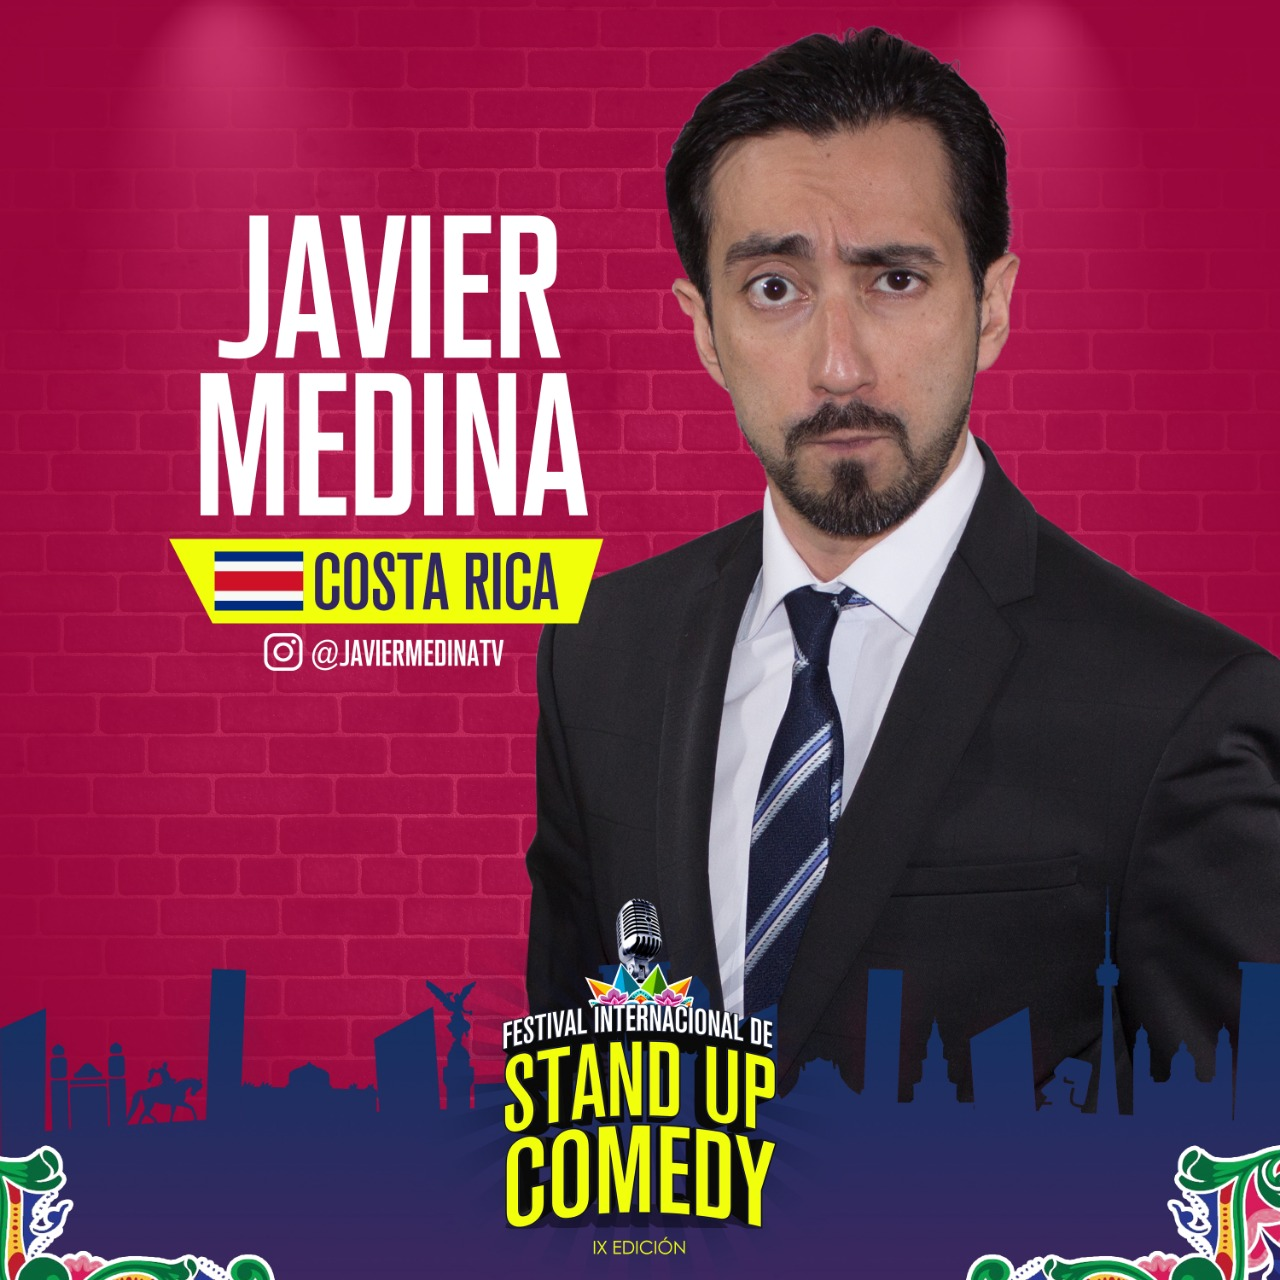 Javier Medina Festival Internacional Stand Up Comedy 2019